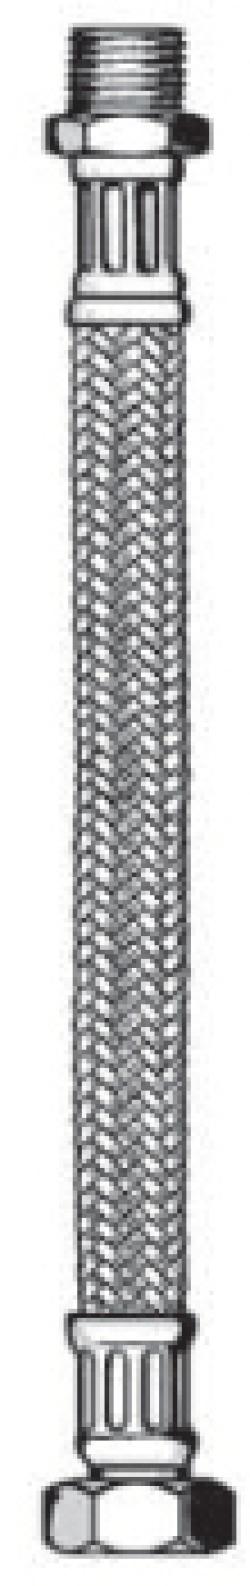 МЕ 5625.1227.60 Meiflex Dn18, 3/4 BPx3/4 BP, 600mm